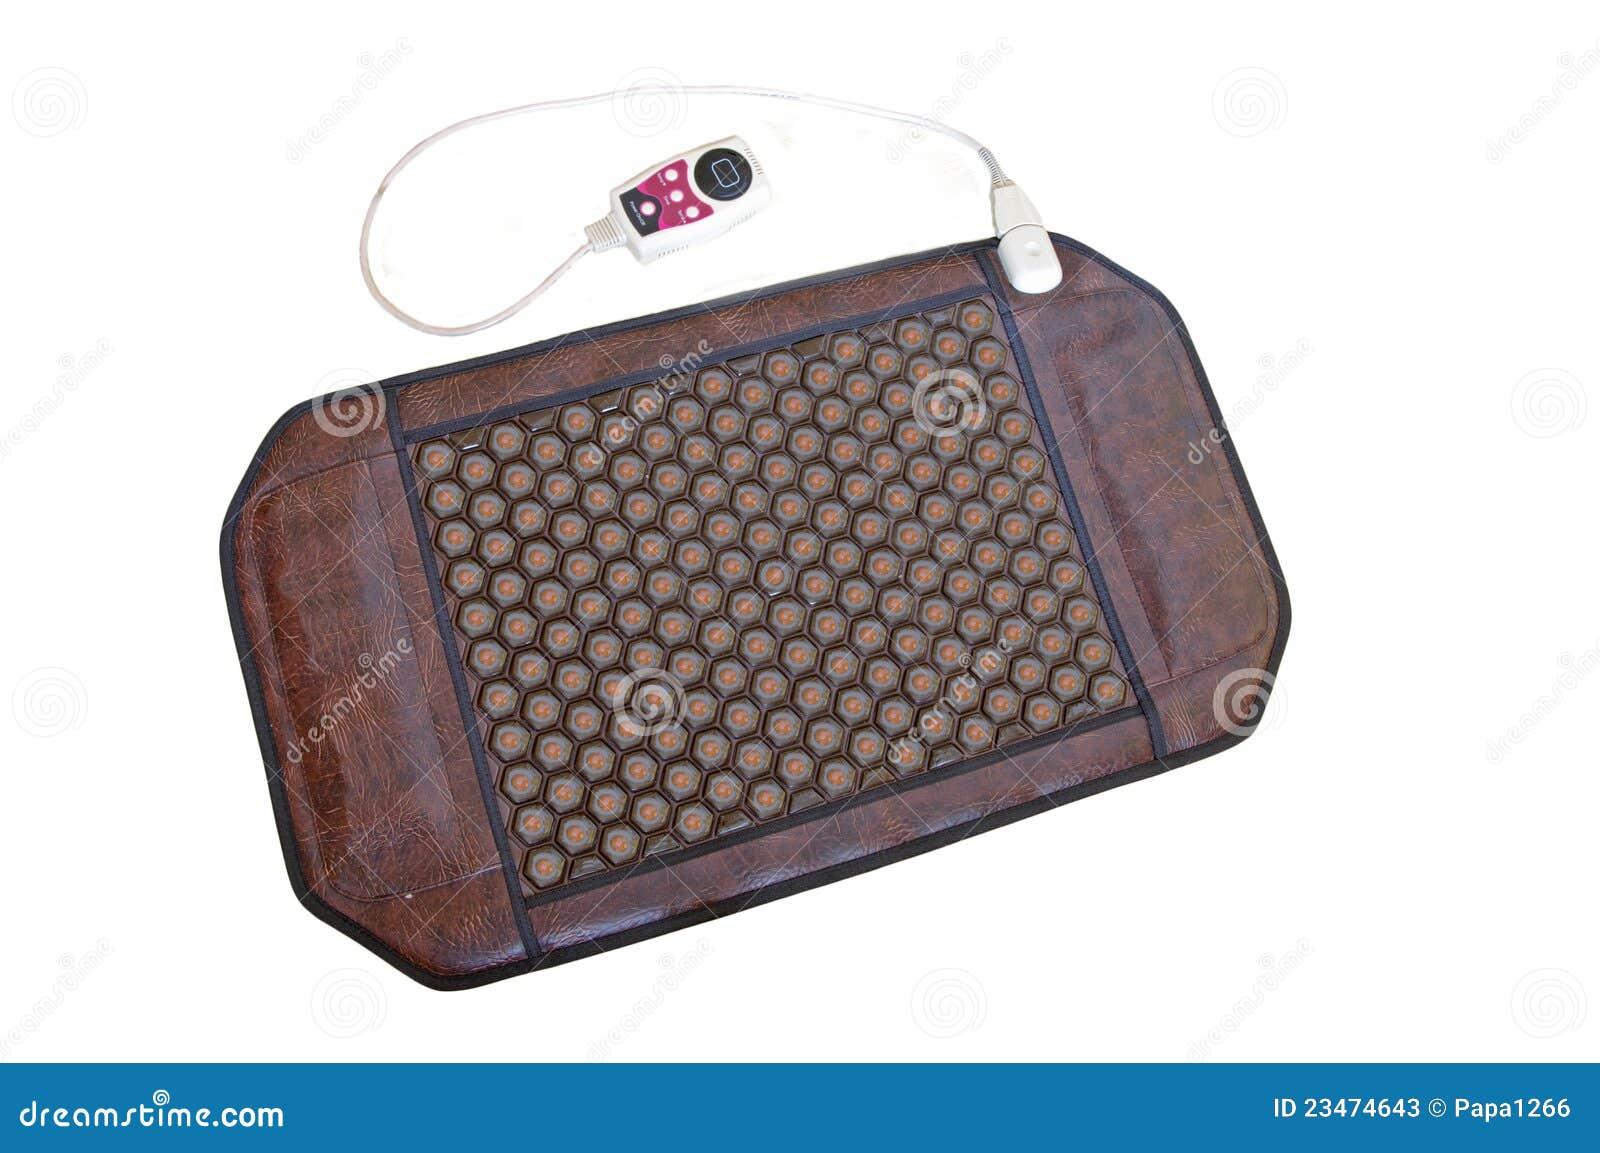 Warmth Heated Mattress Pad Stock s Image